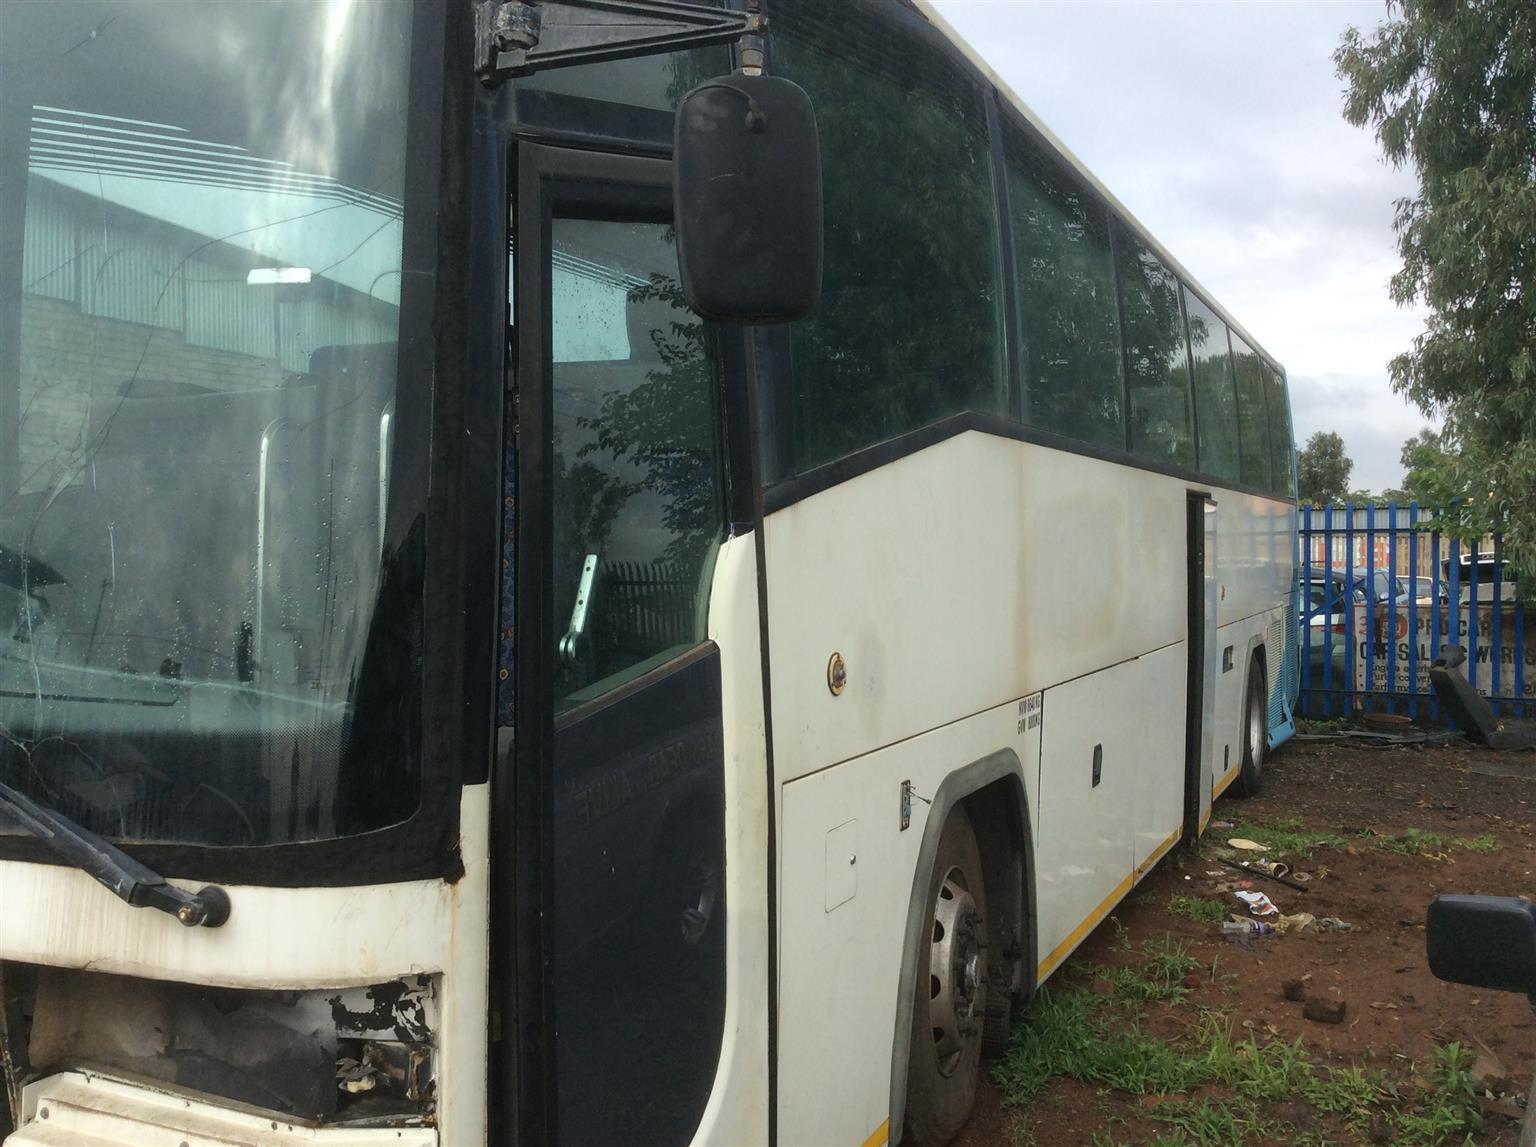 Mercedes Benz bus